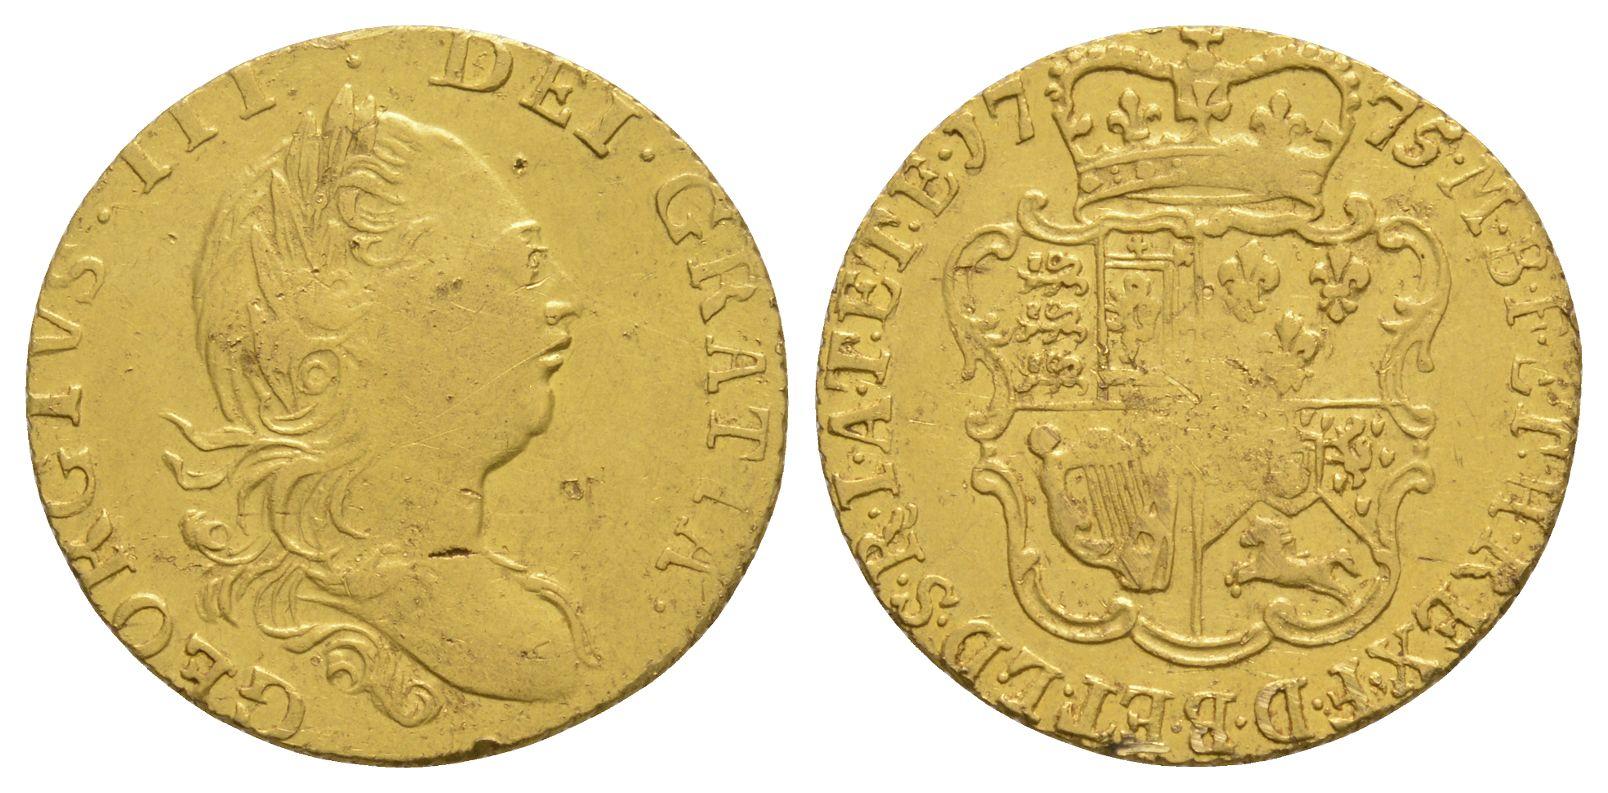 English Milled Coins - George III - 1775 - Half Guinea